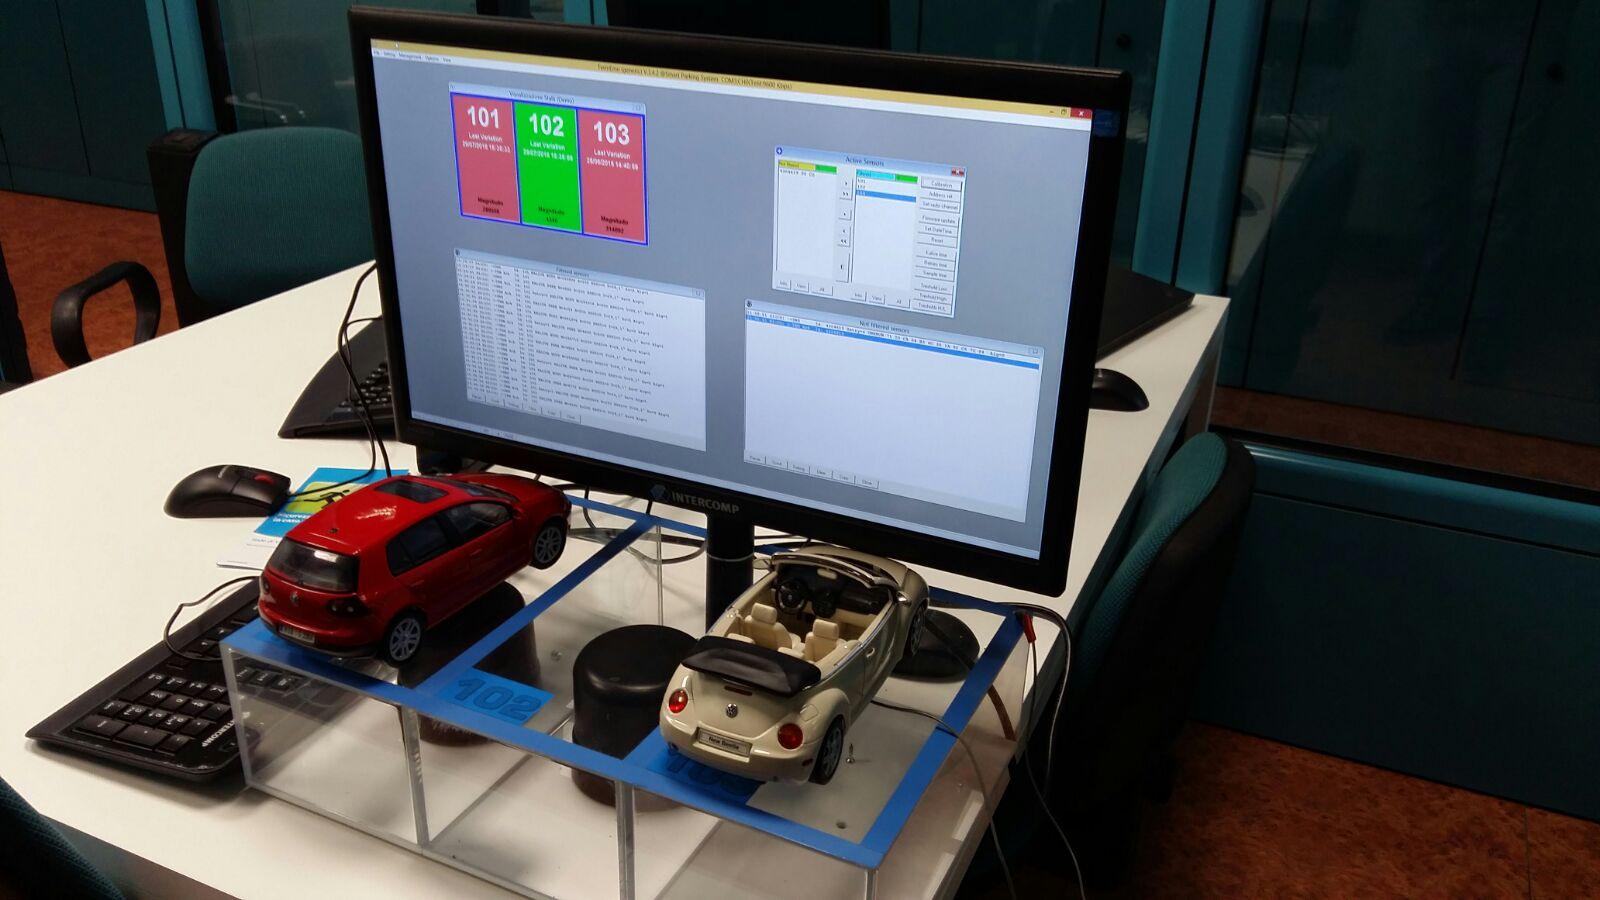 Smart parking test at Smart City Lab   #SmartCity #smartpark  #IoT  #lorawan https://t.co/ydNPCrBW0m